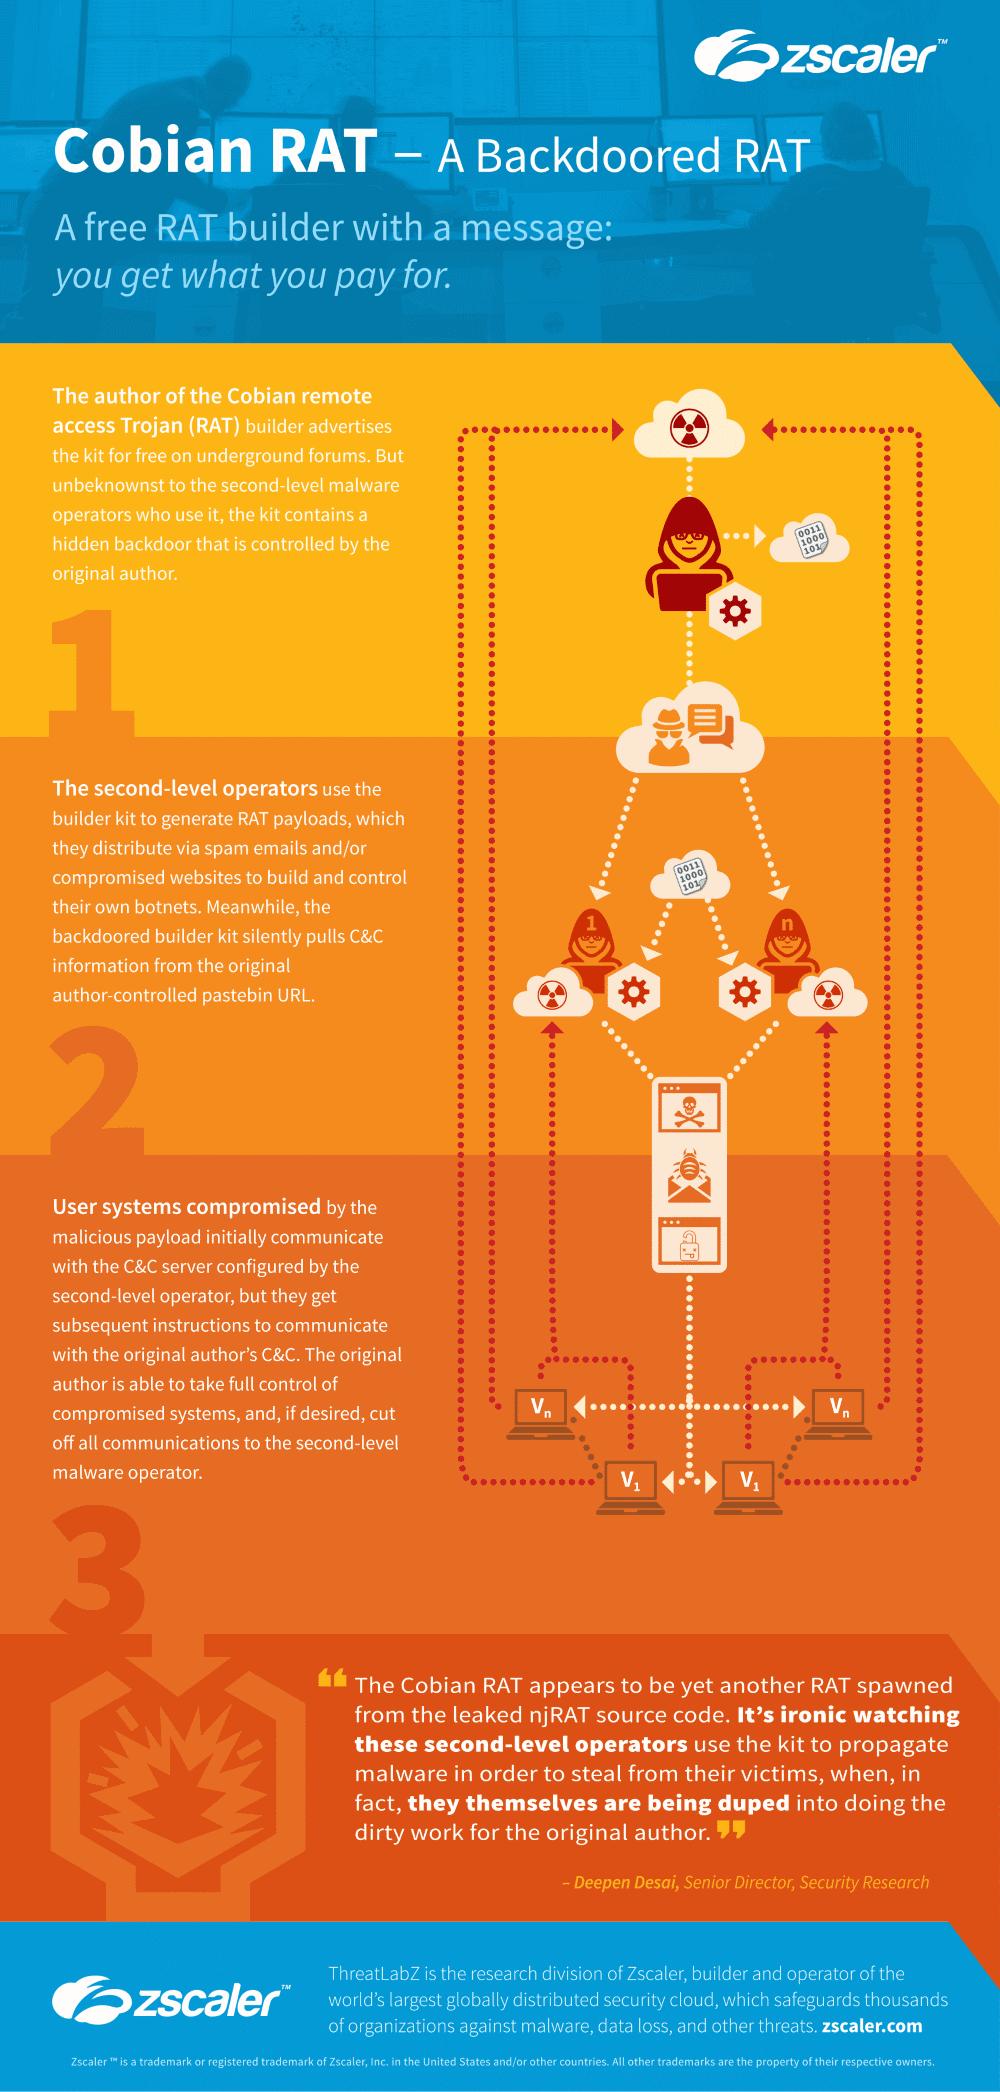 Cobian RAT infographic